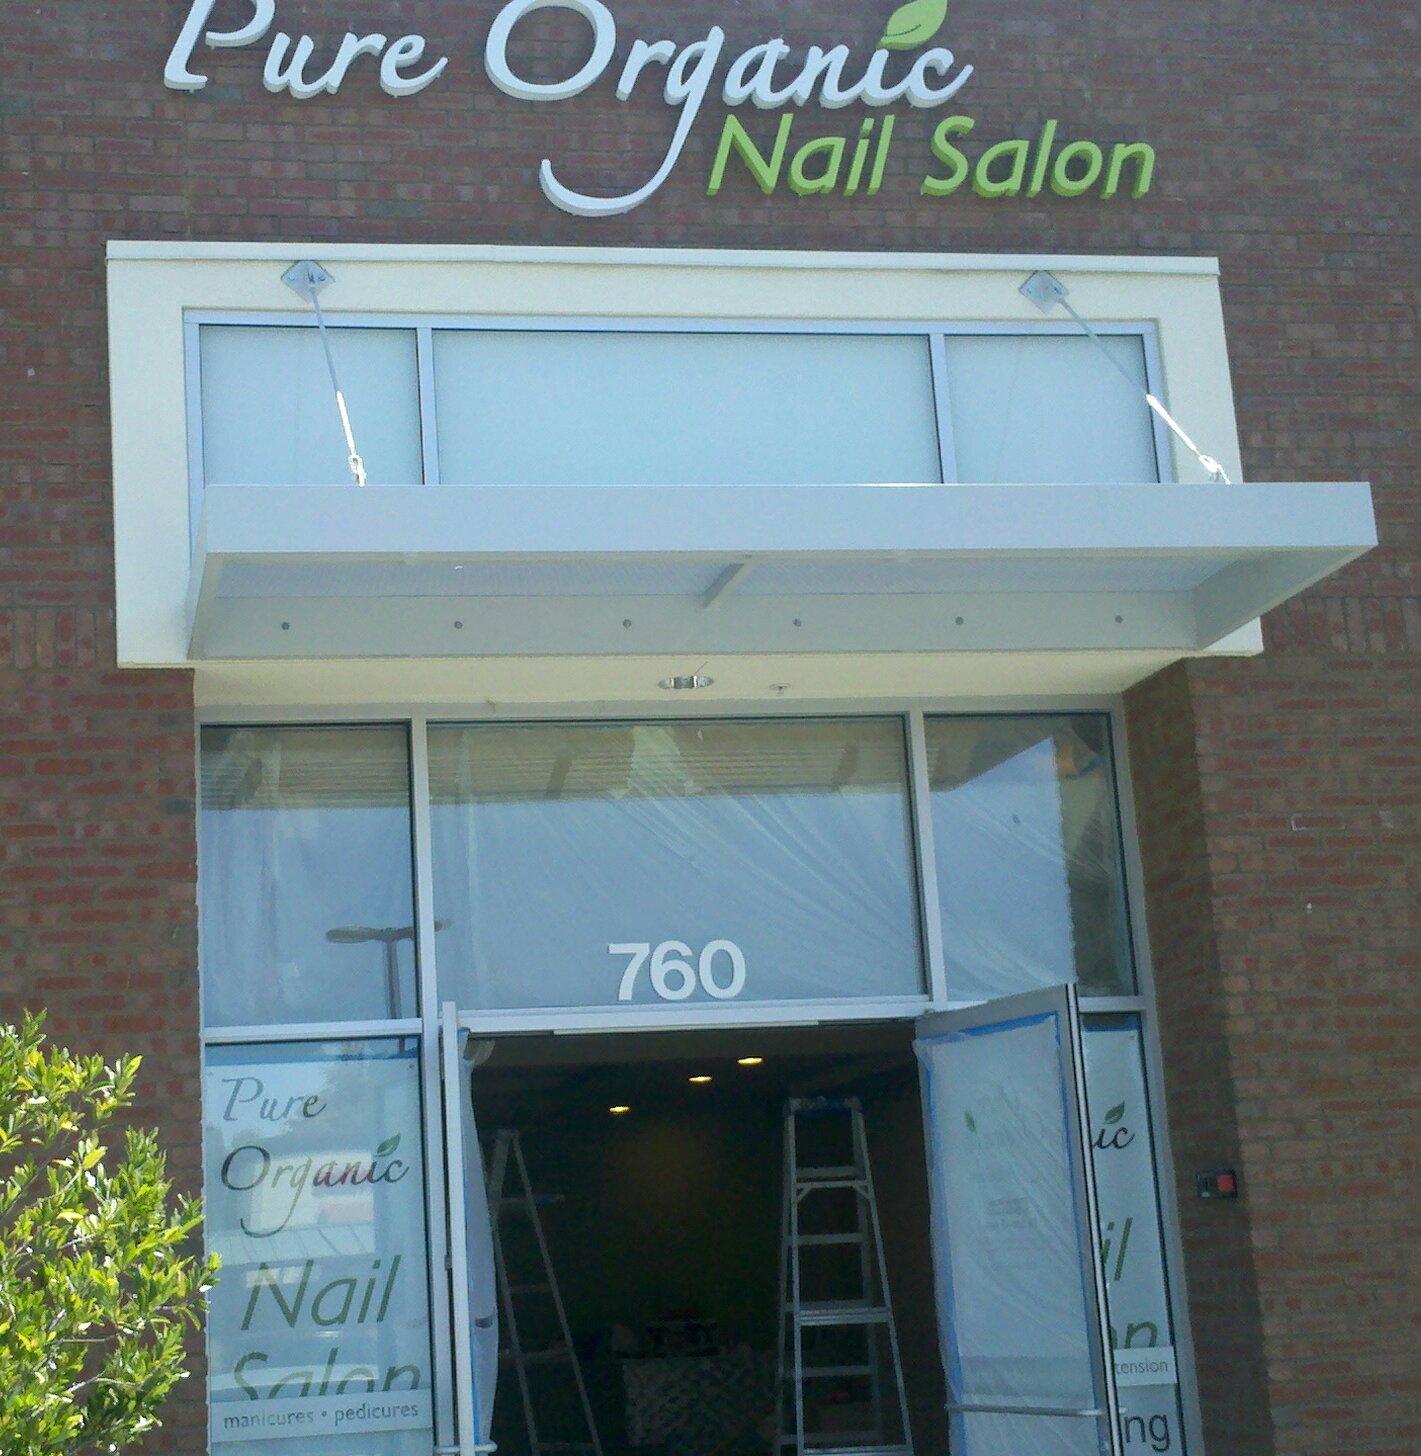 Sprouts & Shutters: Pure Organics Nail Salon Open